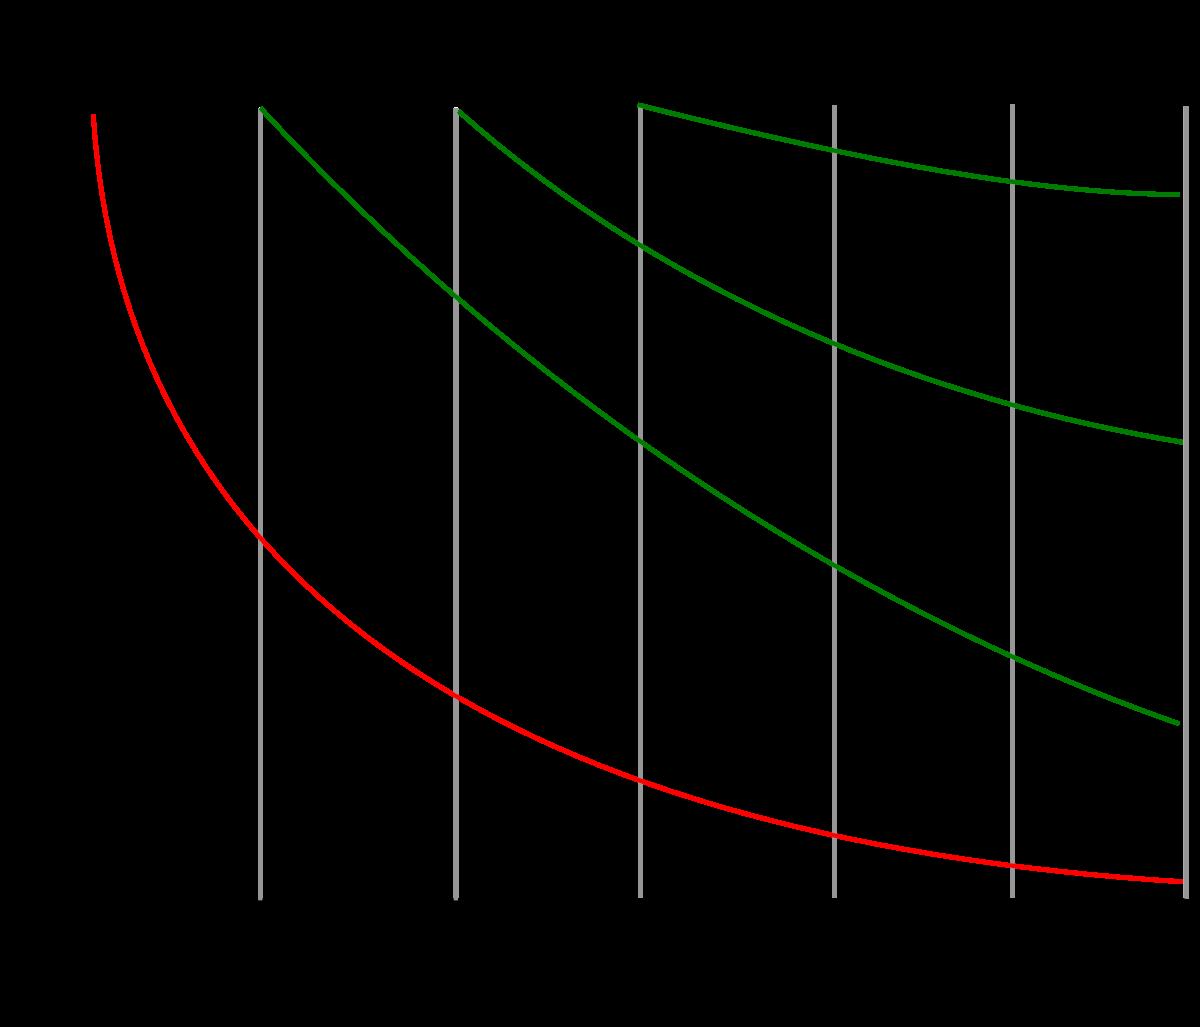 Hermann ebbinghaus forgetting curve pdf